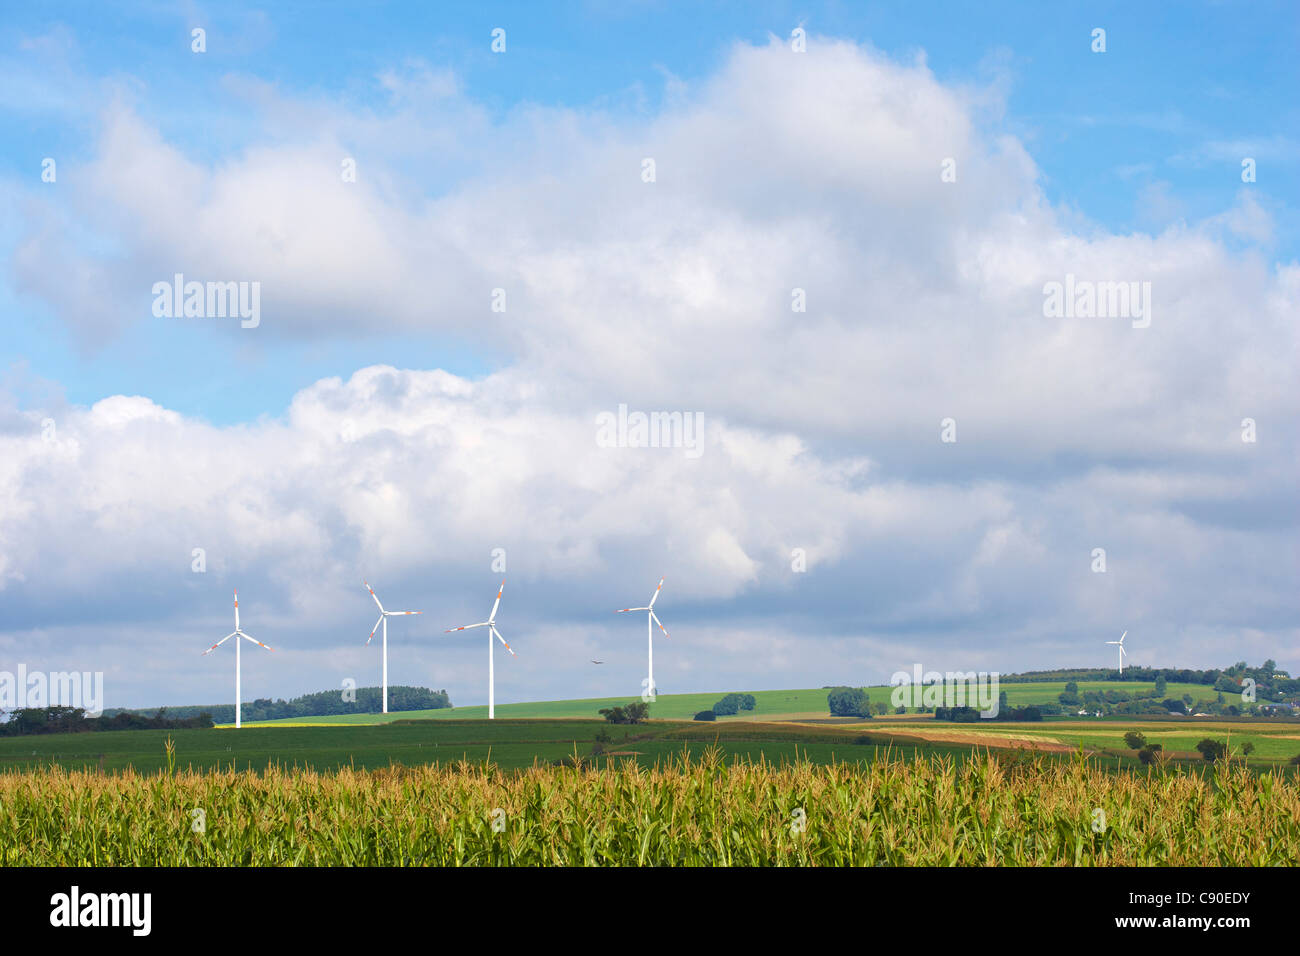 La energía eólica cerca Seinsfeld, Eifel, Renania-Palatinado, Alemania, Europa Imagen De Stock